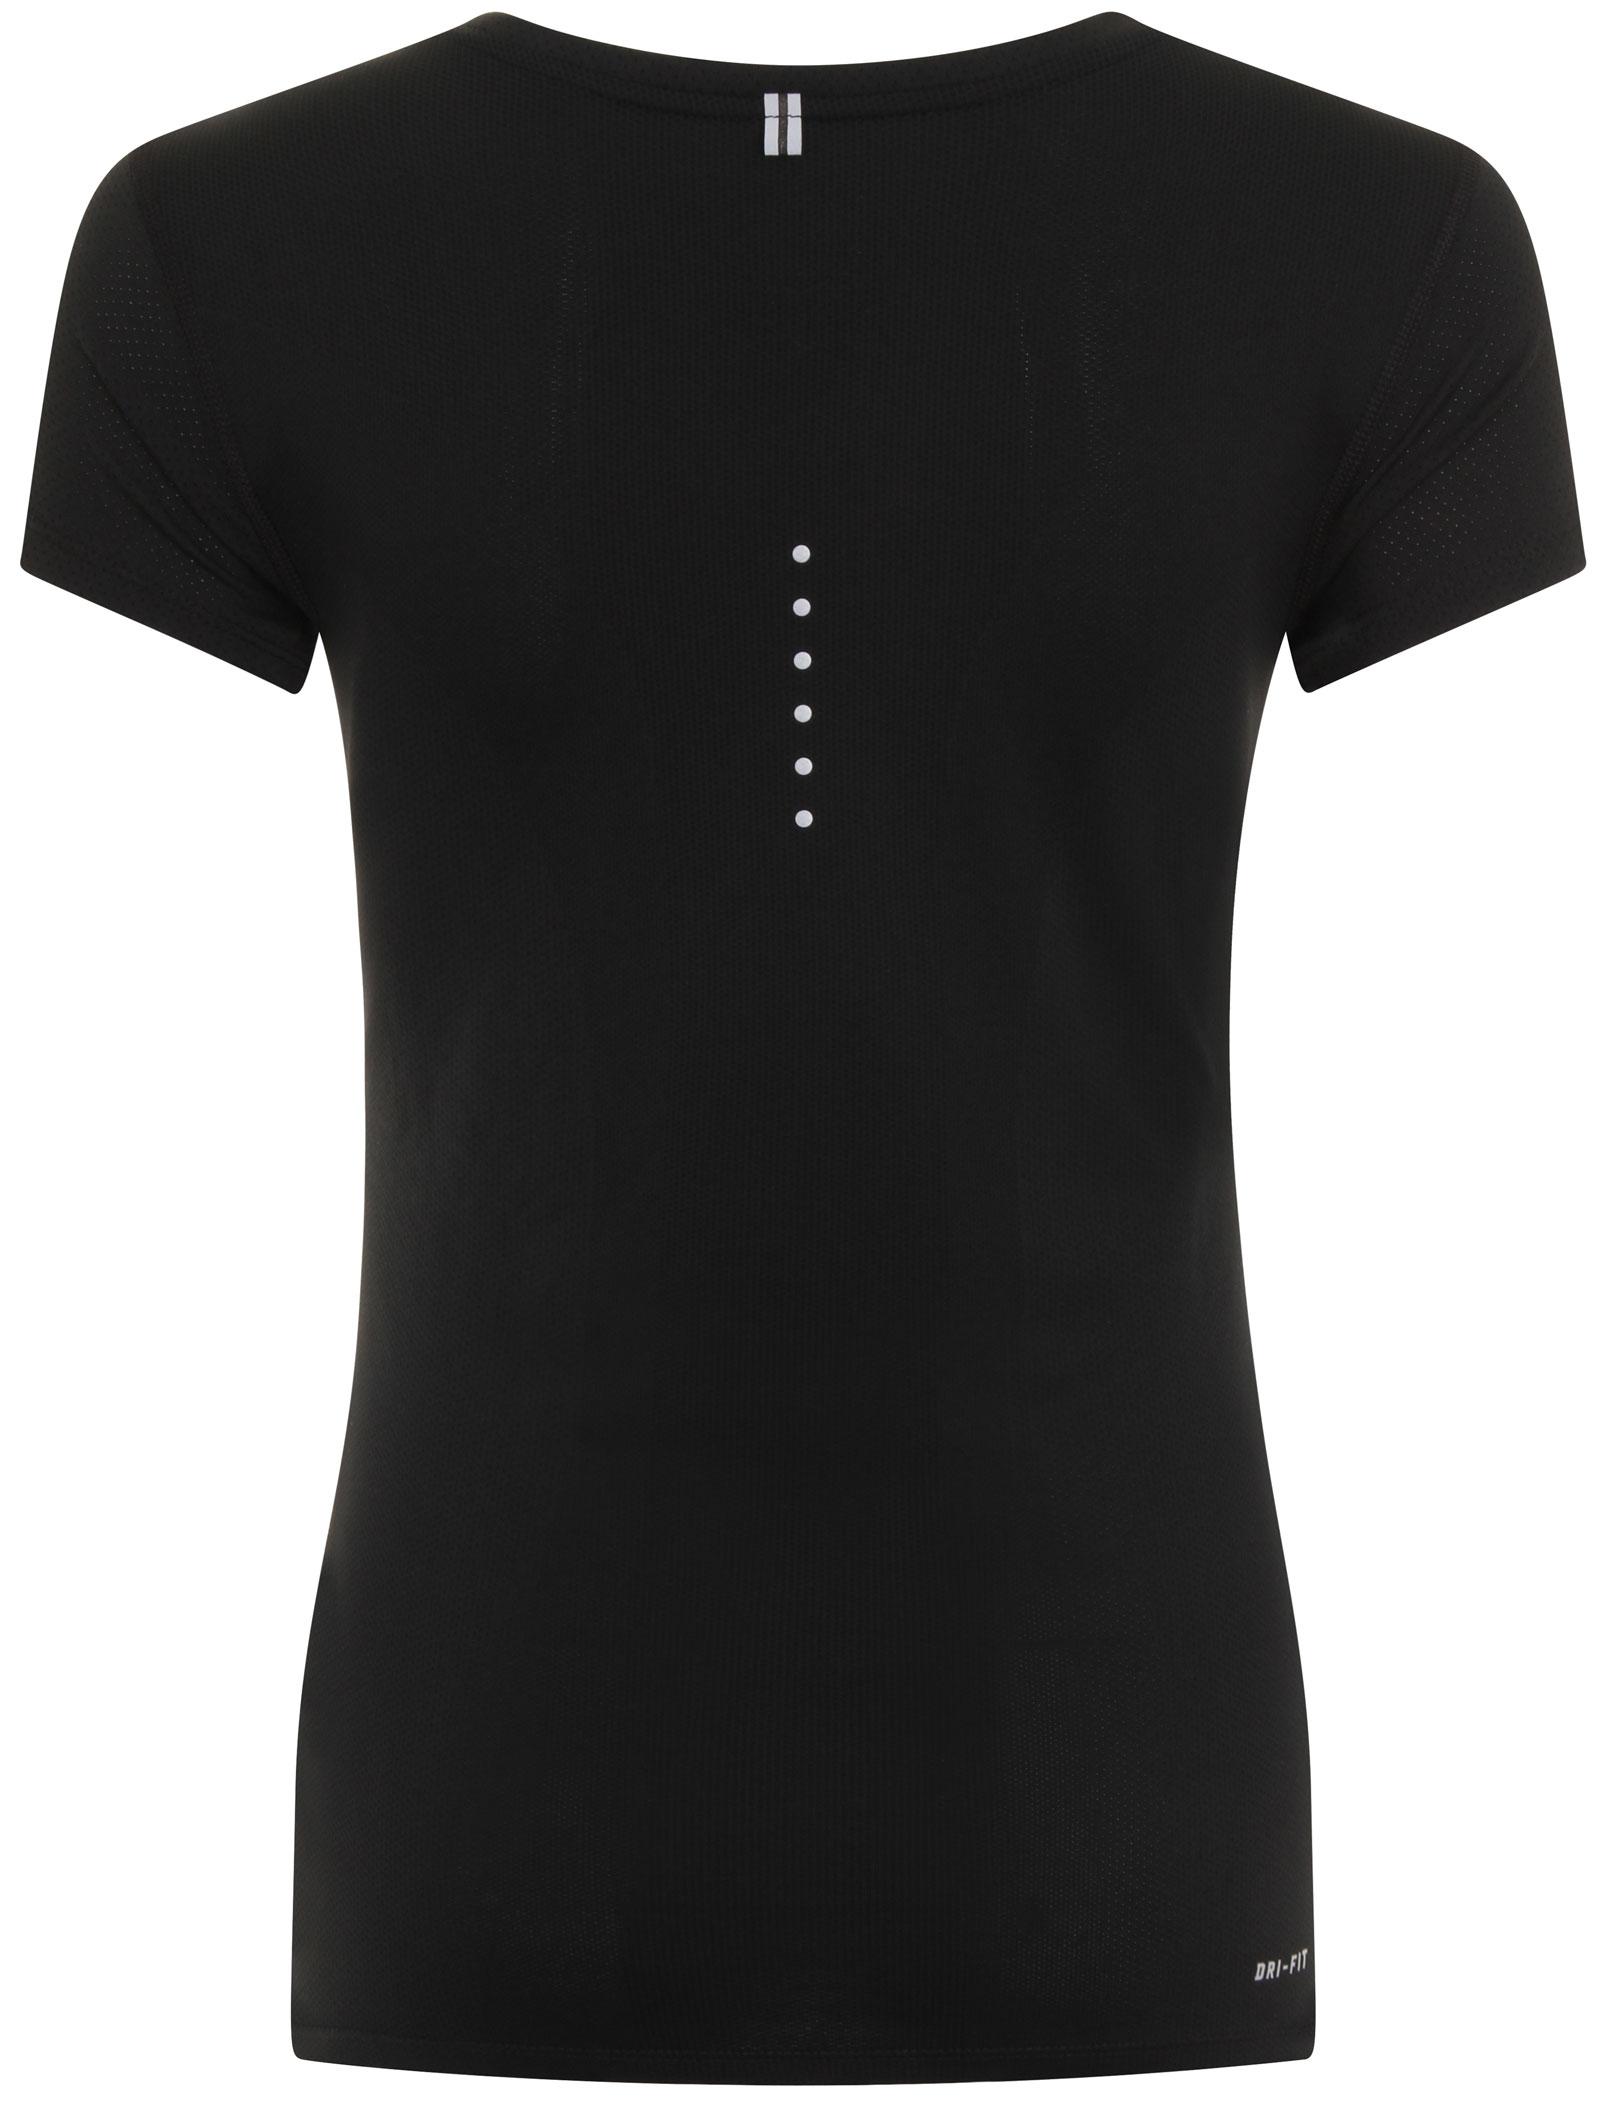 New nike dri fit contour black womens running t shirt for Nike dri fit t shirt ladies